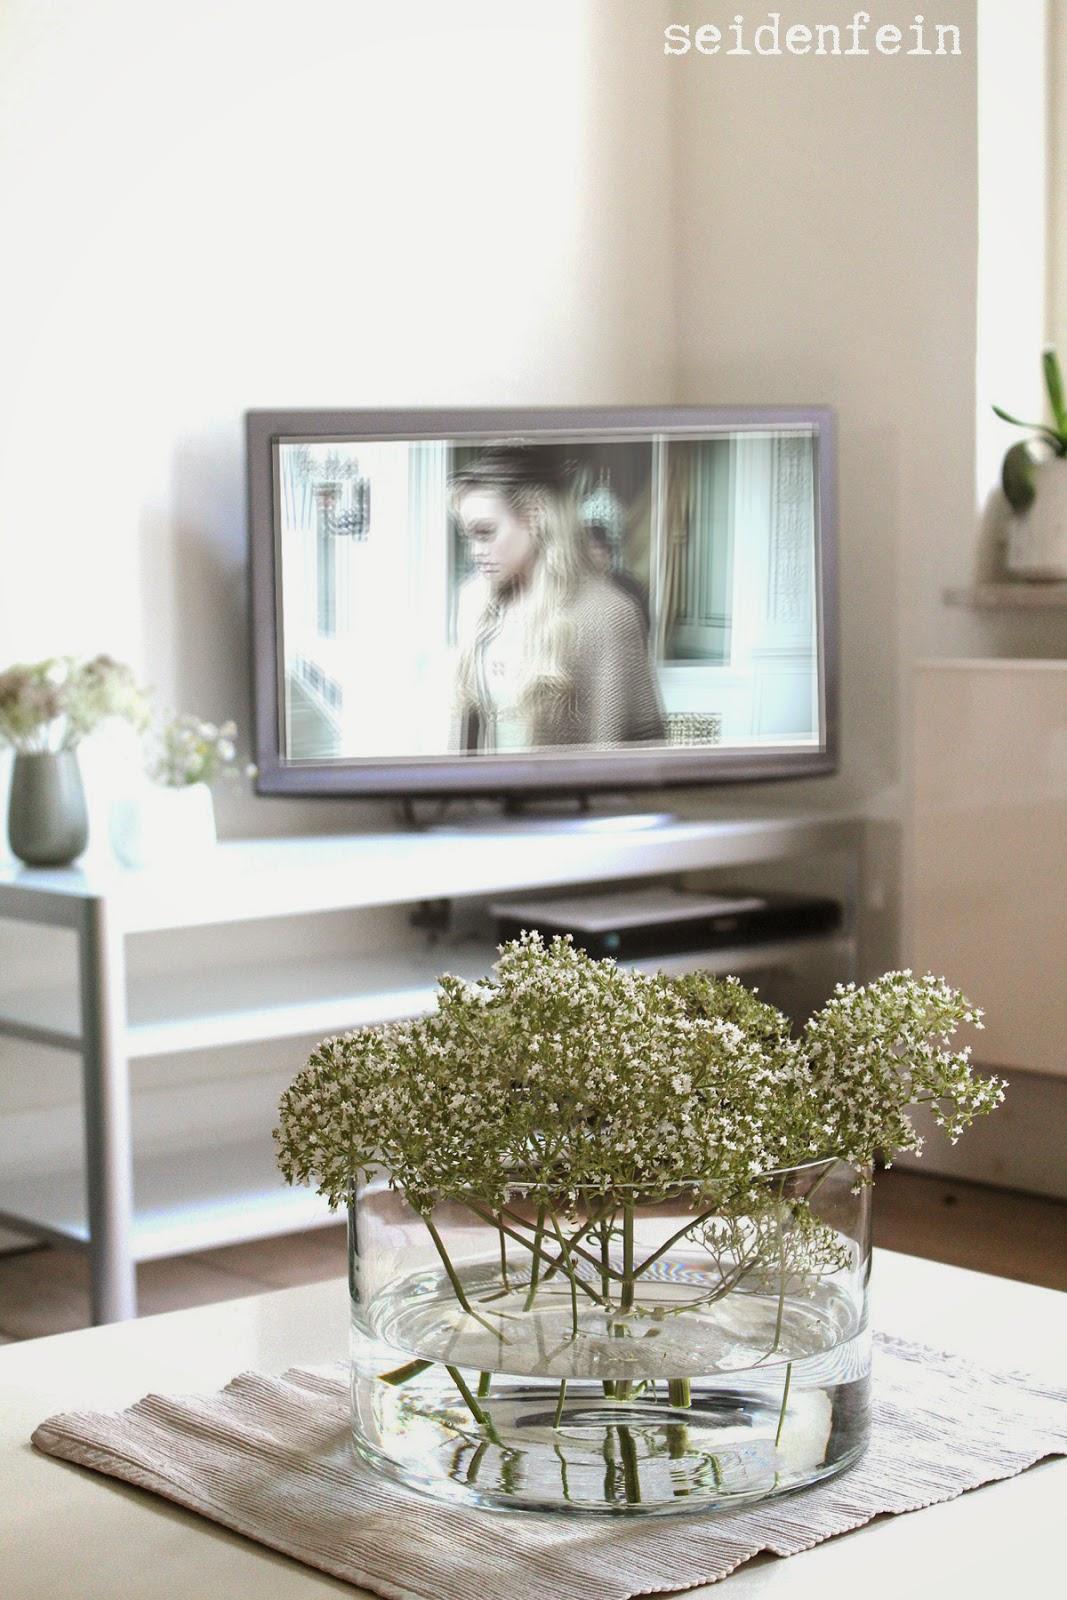 seidenfeins dekoblog freh up ikea gettorp tv board lemon cream crum cake rezept. Black Bedroom Furniture Sets. Home Design Ideas